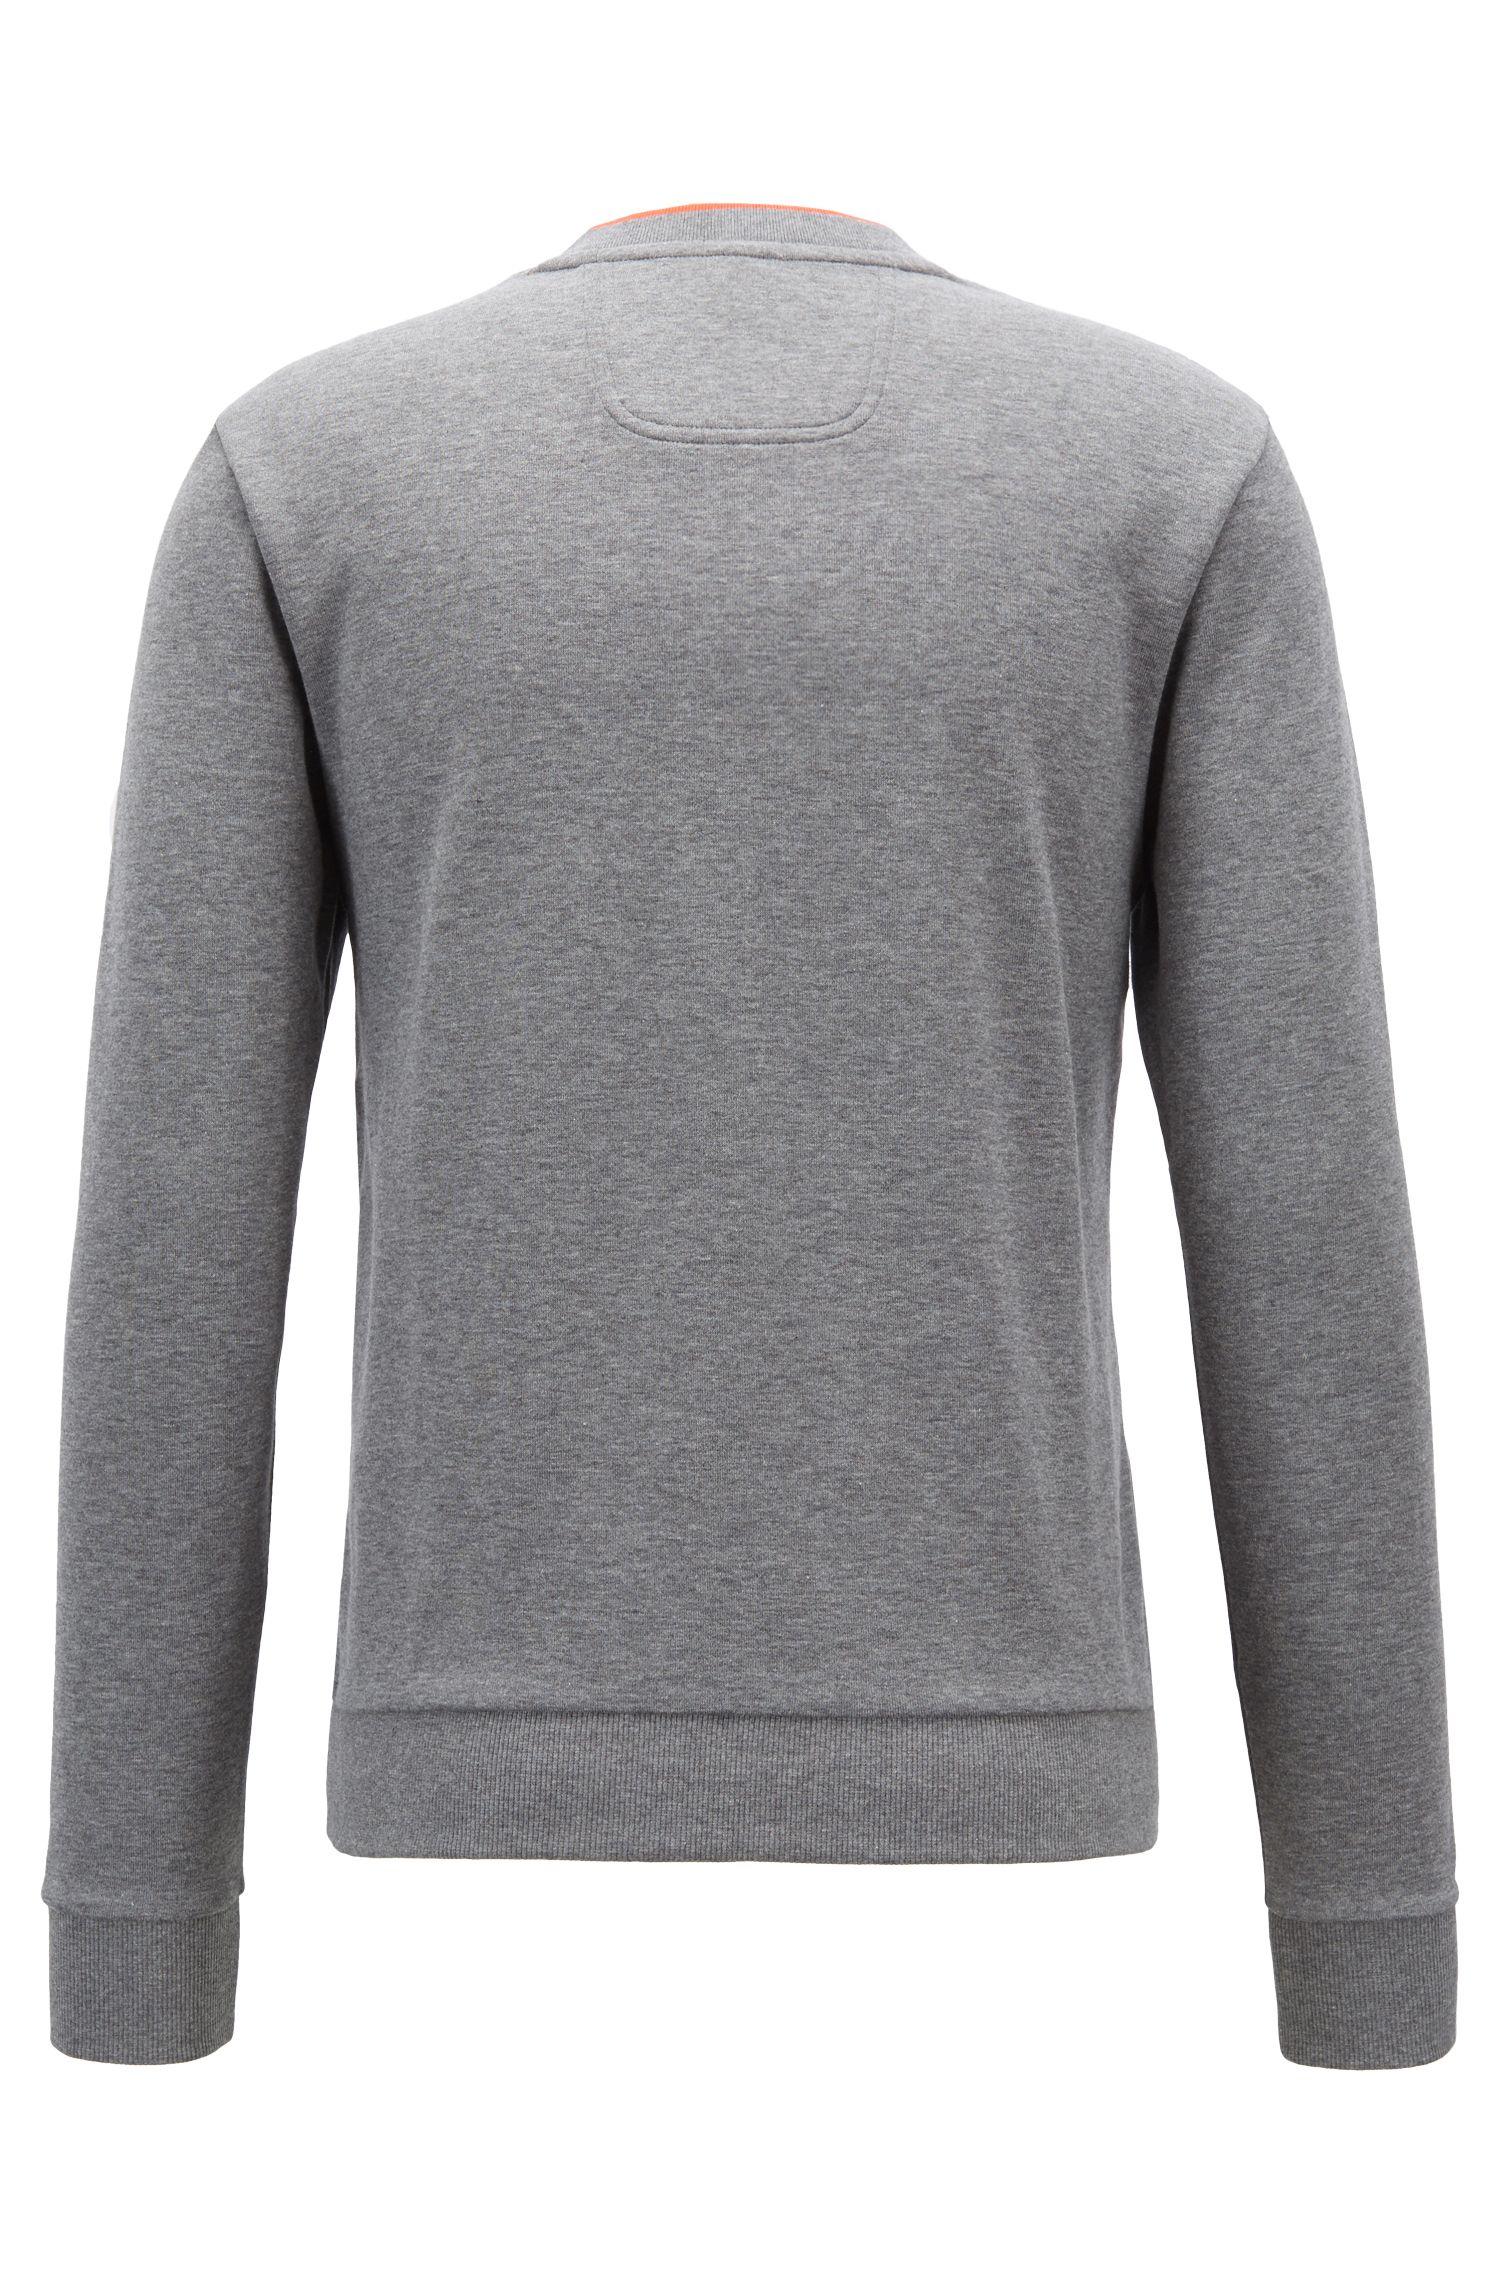 Slim-fit sweatshirt with tonal embossed logo, Grey